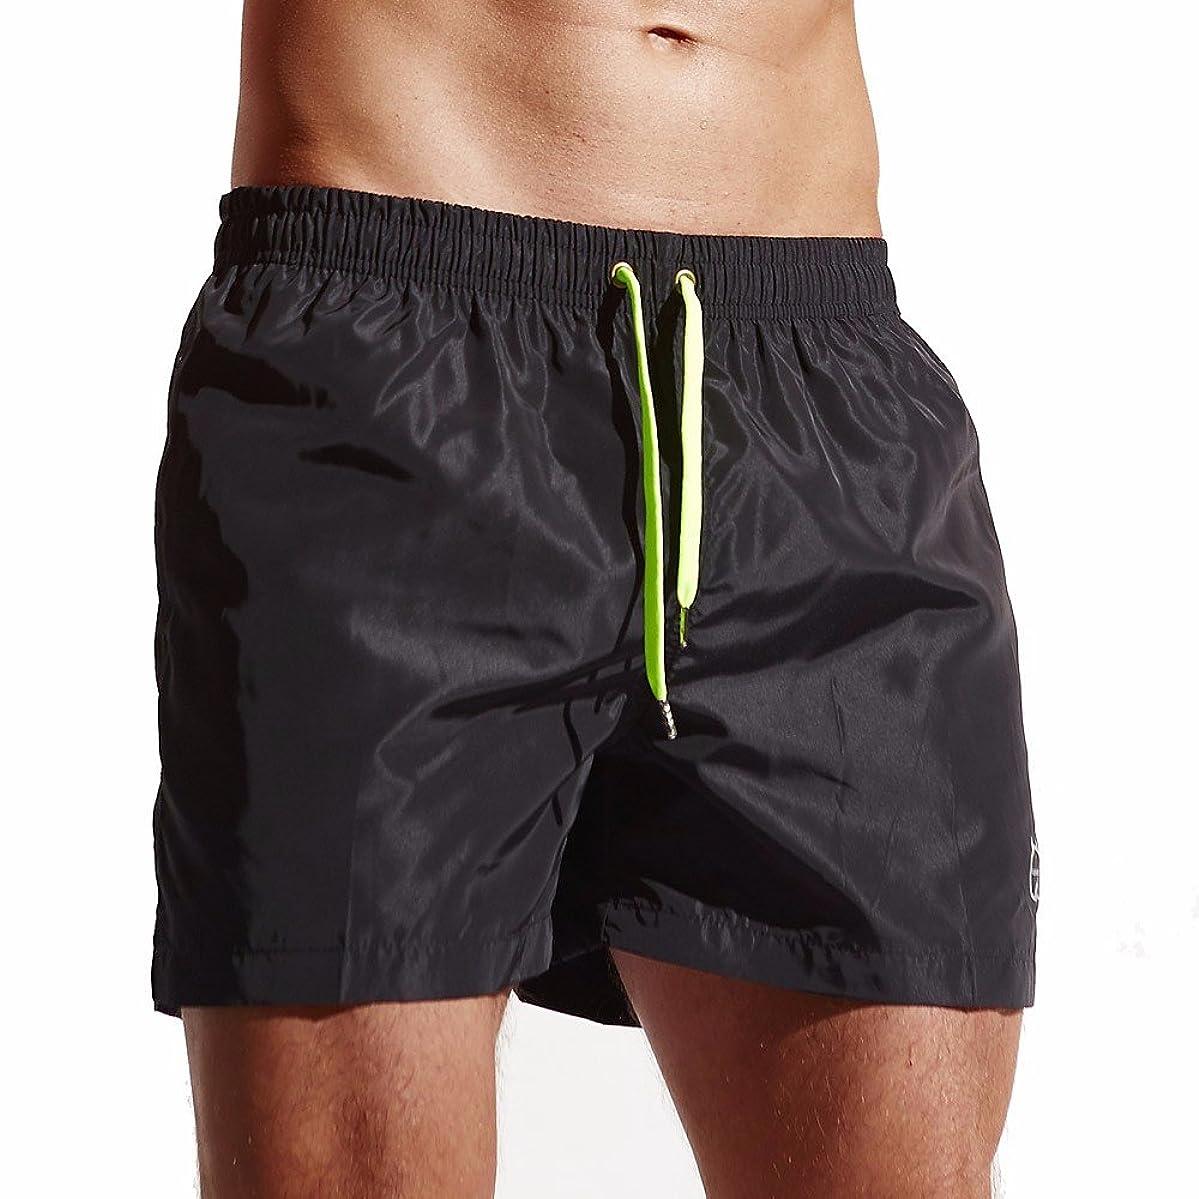 haoricu Men Beach Shorts Quick Dry Swim Trunk Pants Pockets Surfing Swimming Watershort